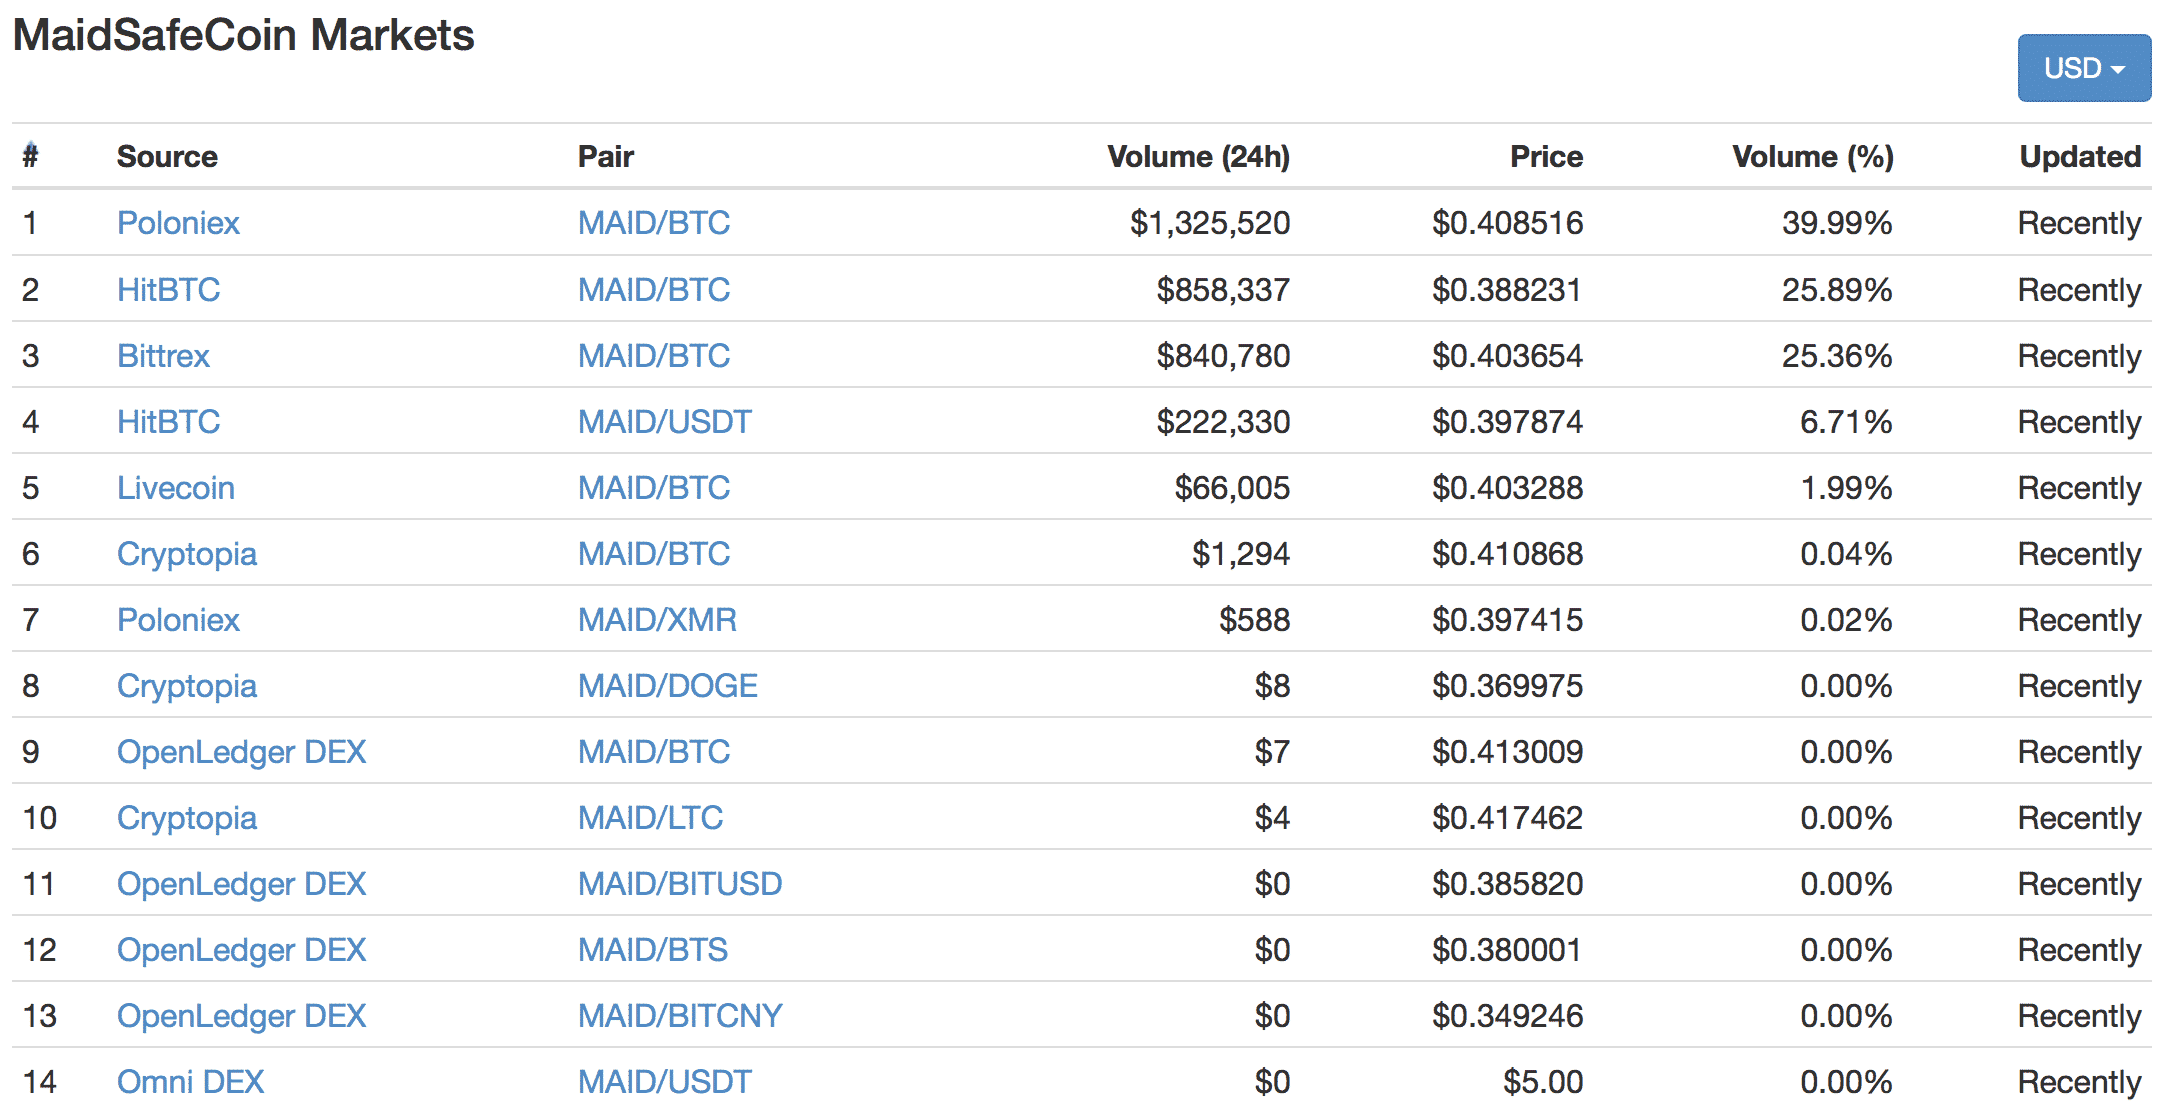 MaidSafeCoin(メイドセーフコイン)とは|仮想通貨の特徴・価格・チャート・購入方法2